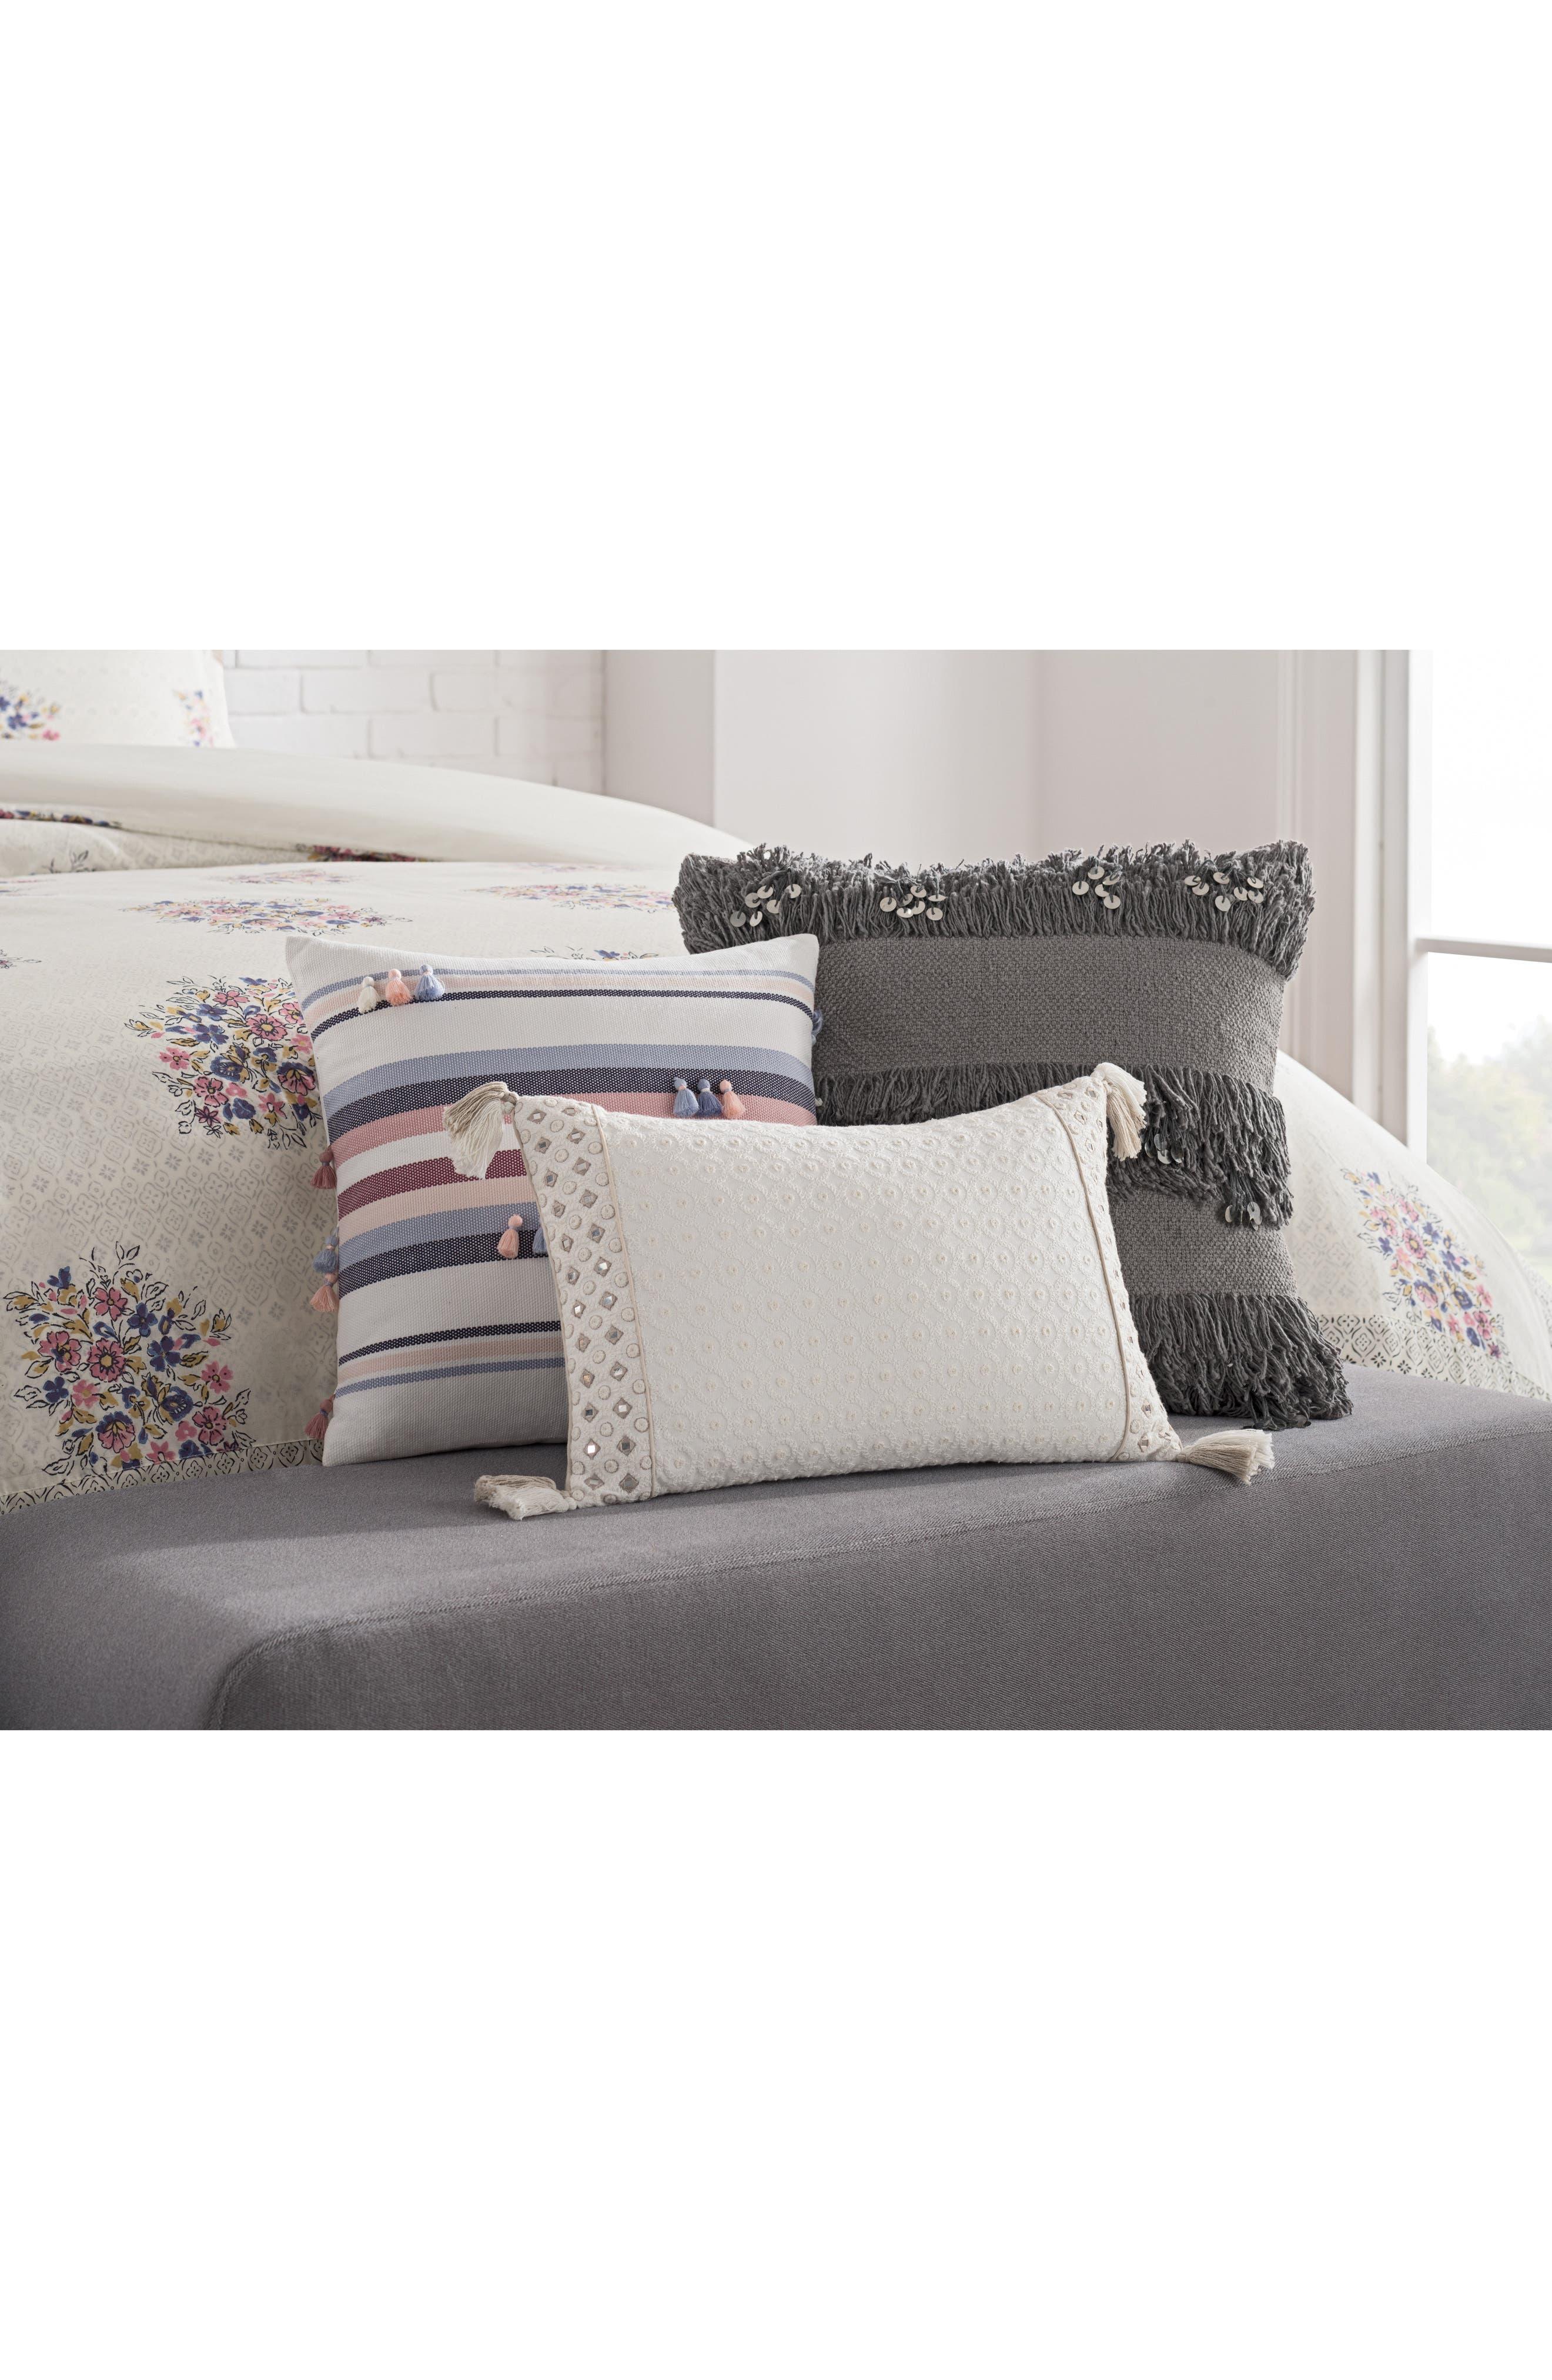 Tassel Stripe Accent Pillow,                             Alternate thumbnail 2, color,                             Purple Multi